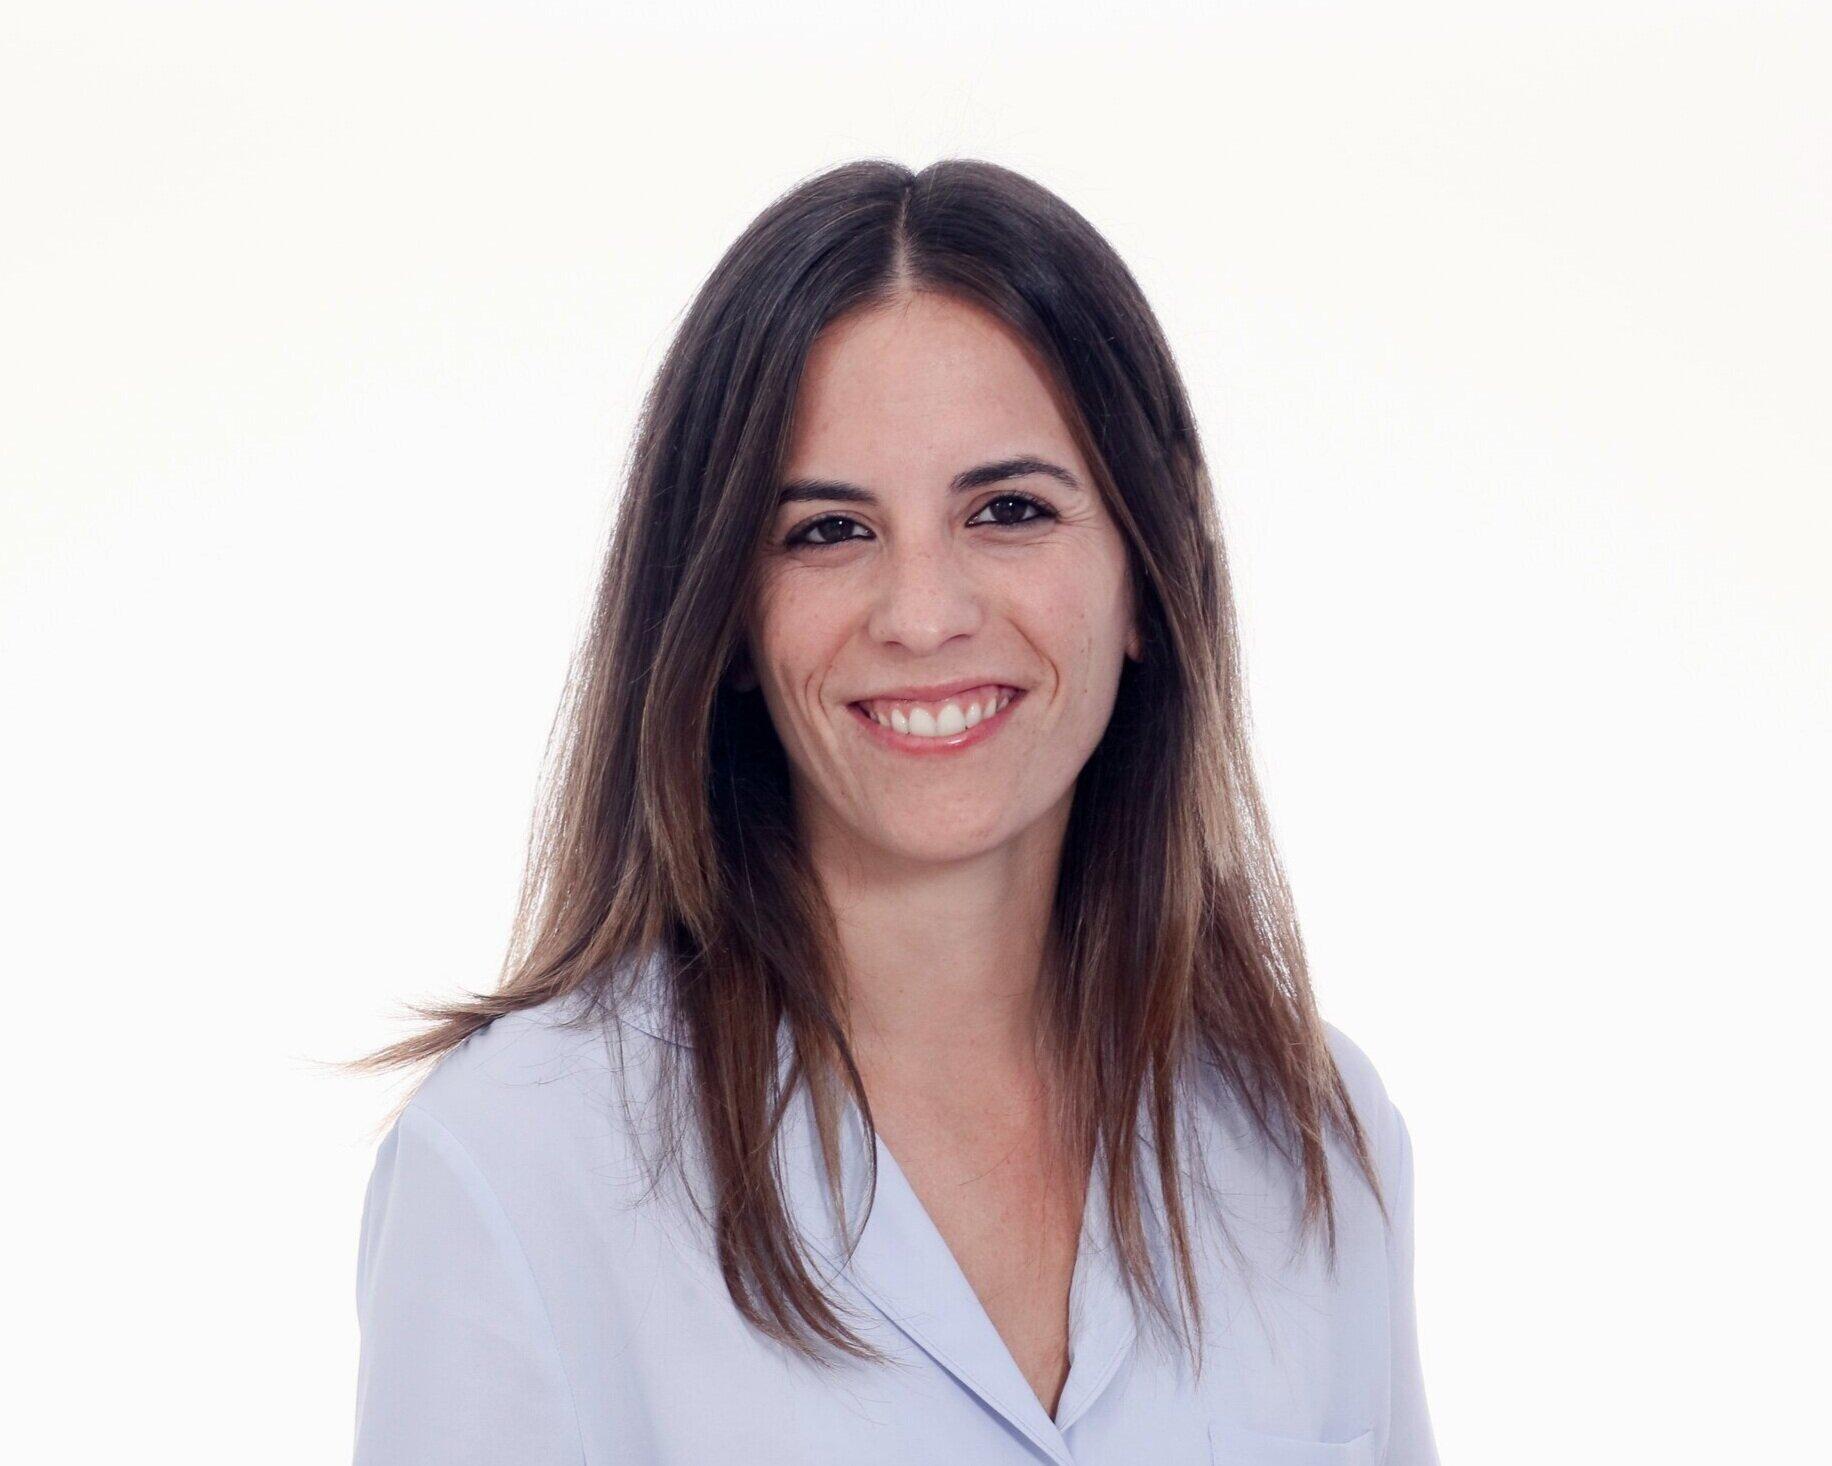 Natalia Sanz Velasco - Psicóloga clínica experta en Terapia de pareja